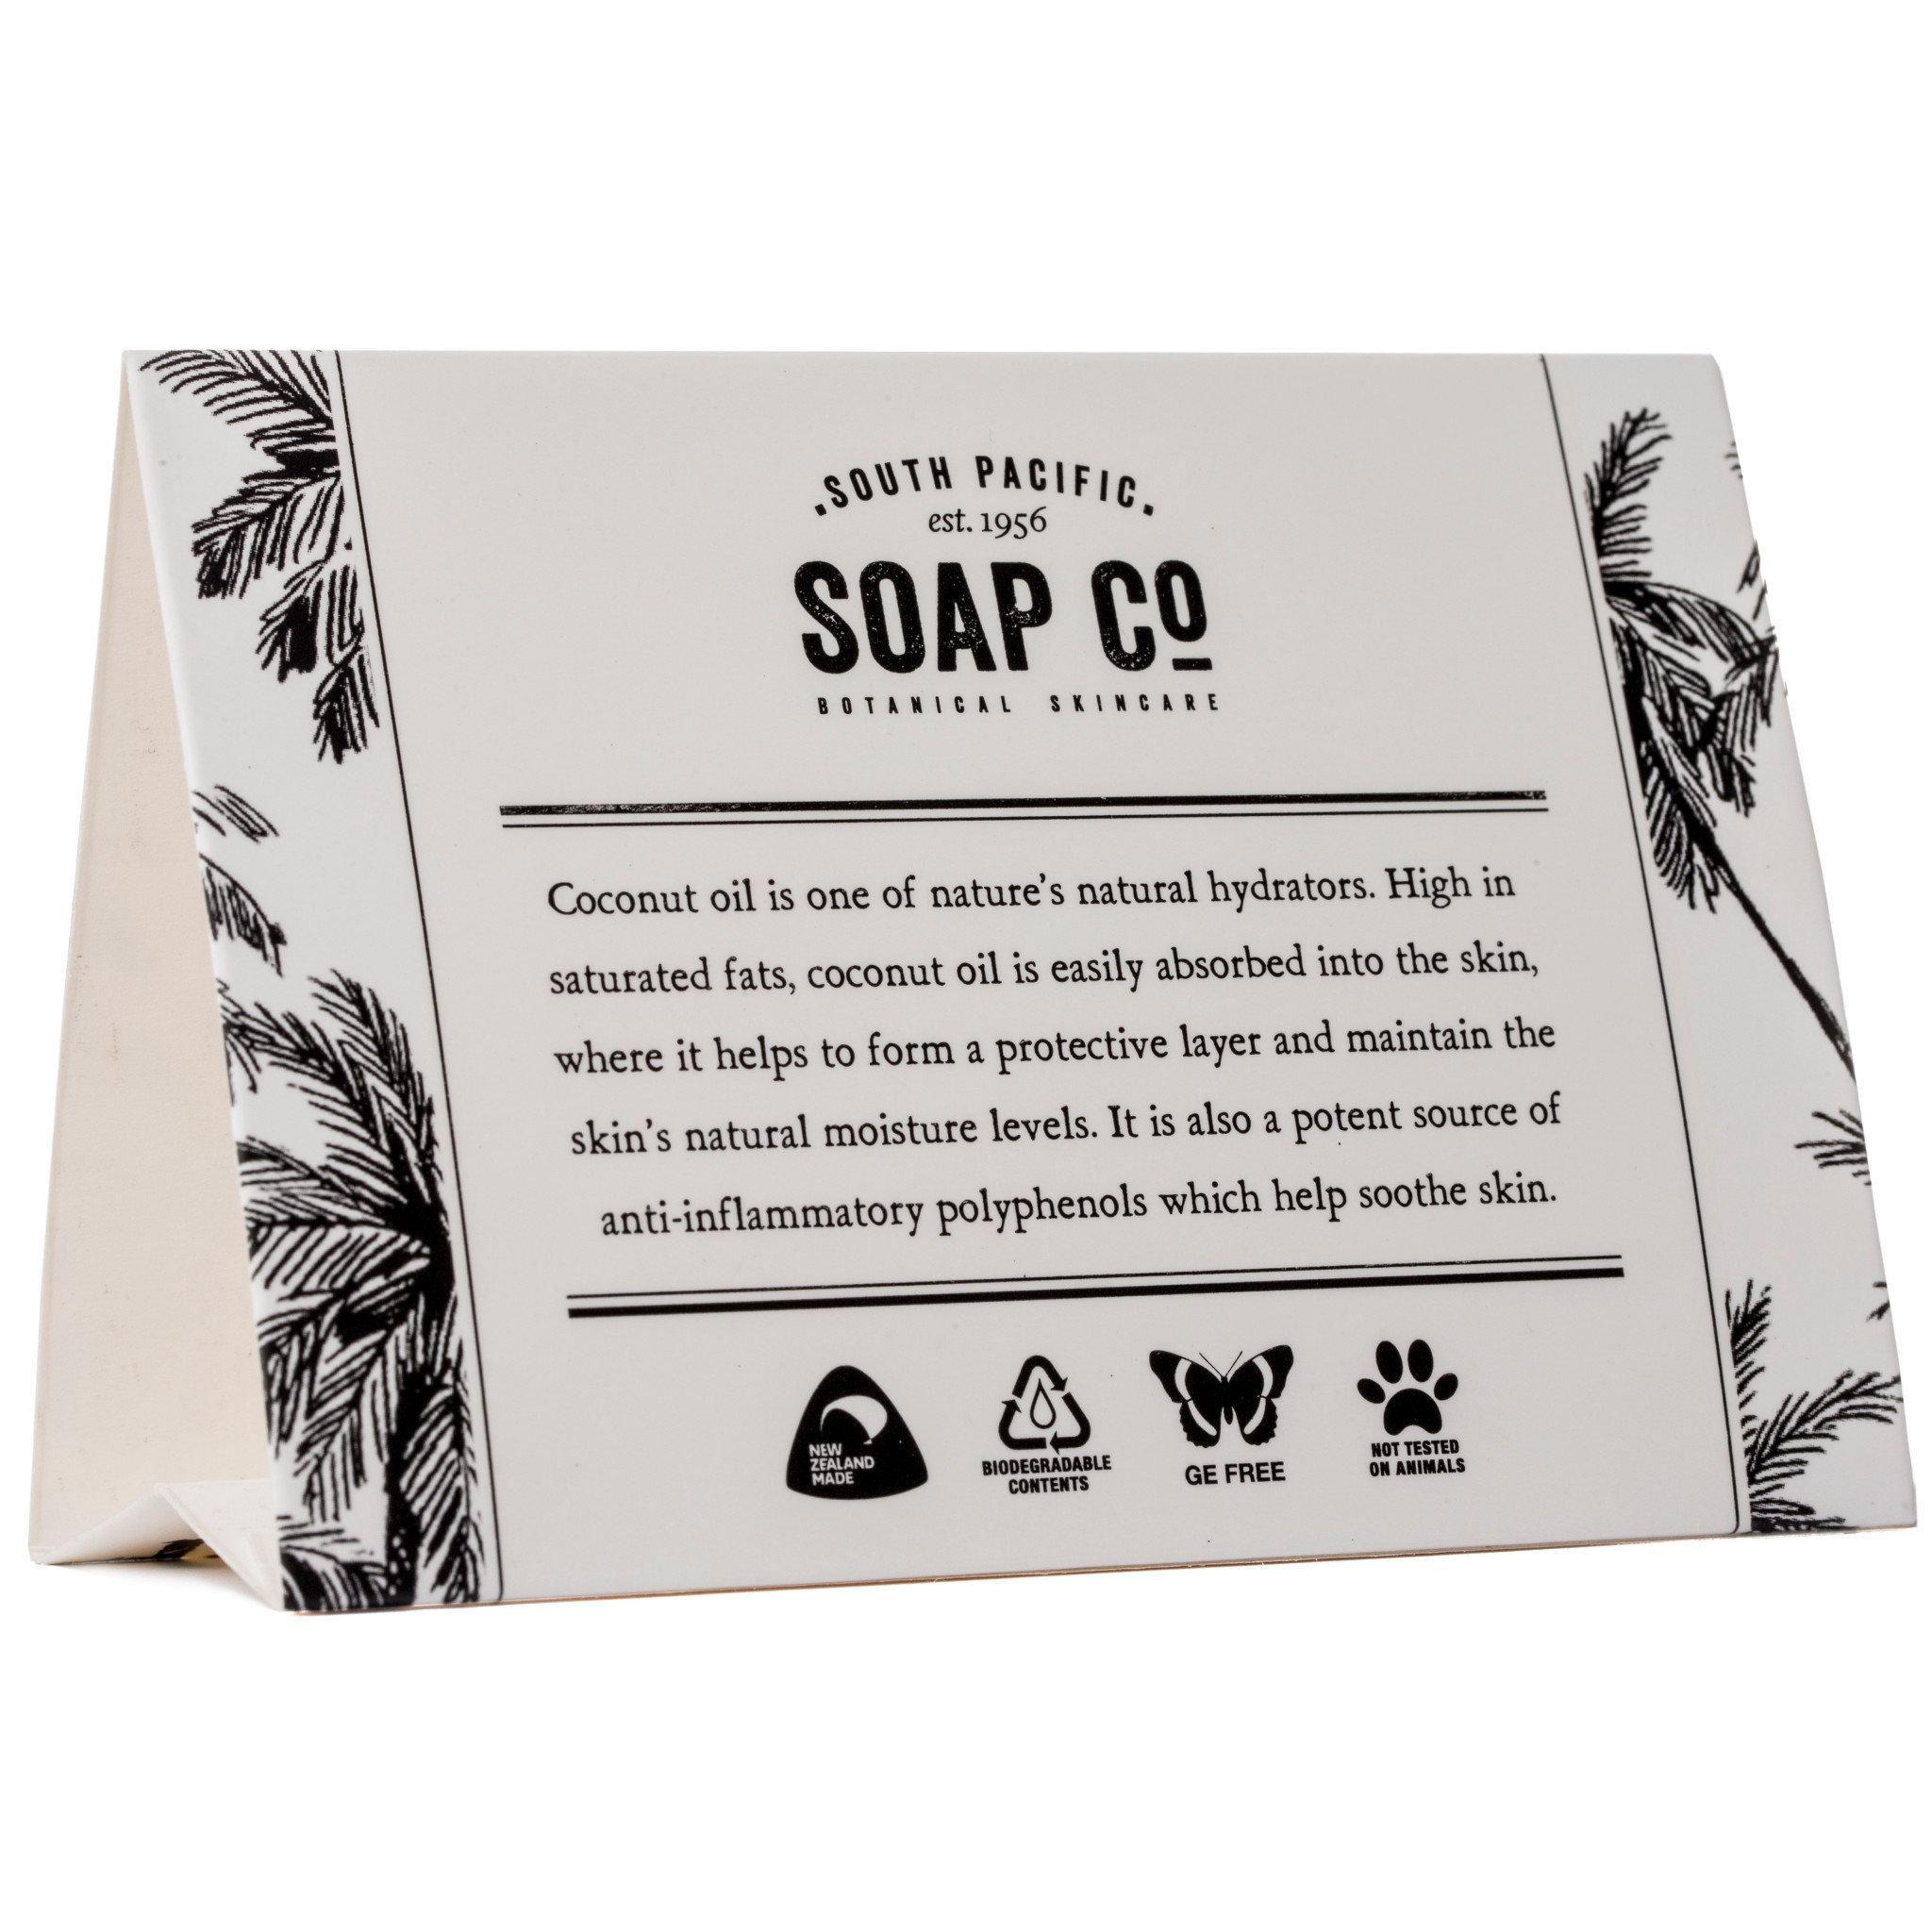 South Pacific Soap Co EnviroTent Card (Bulk)